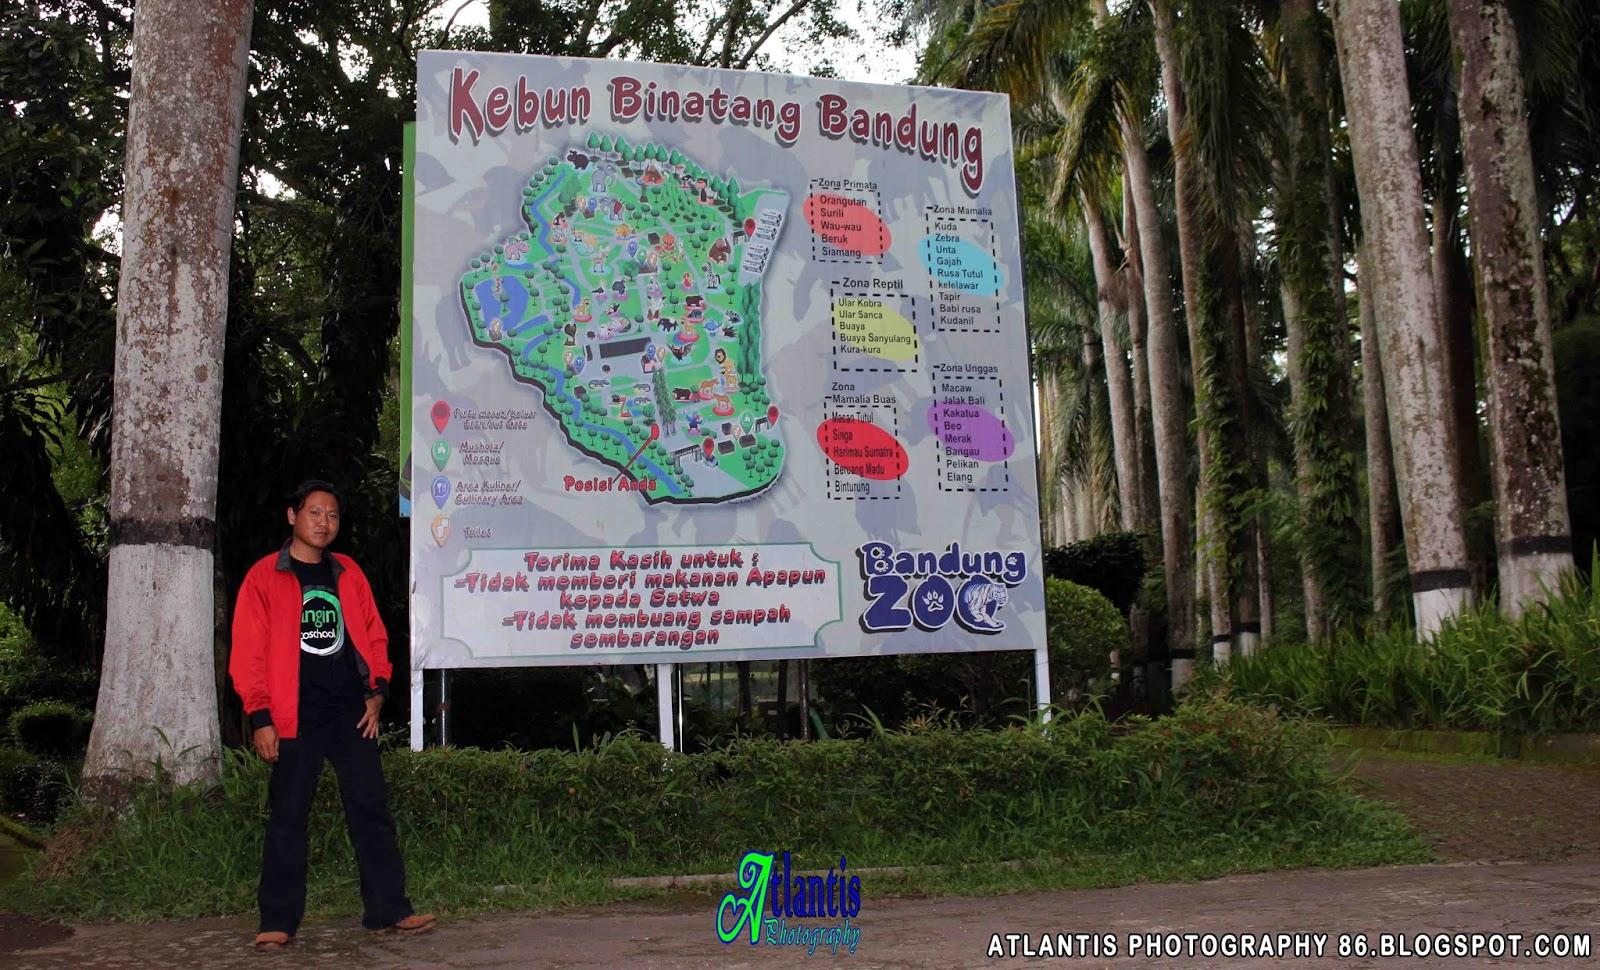 Atlantis Photography Krui Bandung Zoo Kebun Binatang Berada Jalan Tamansari